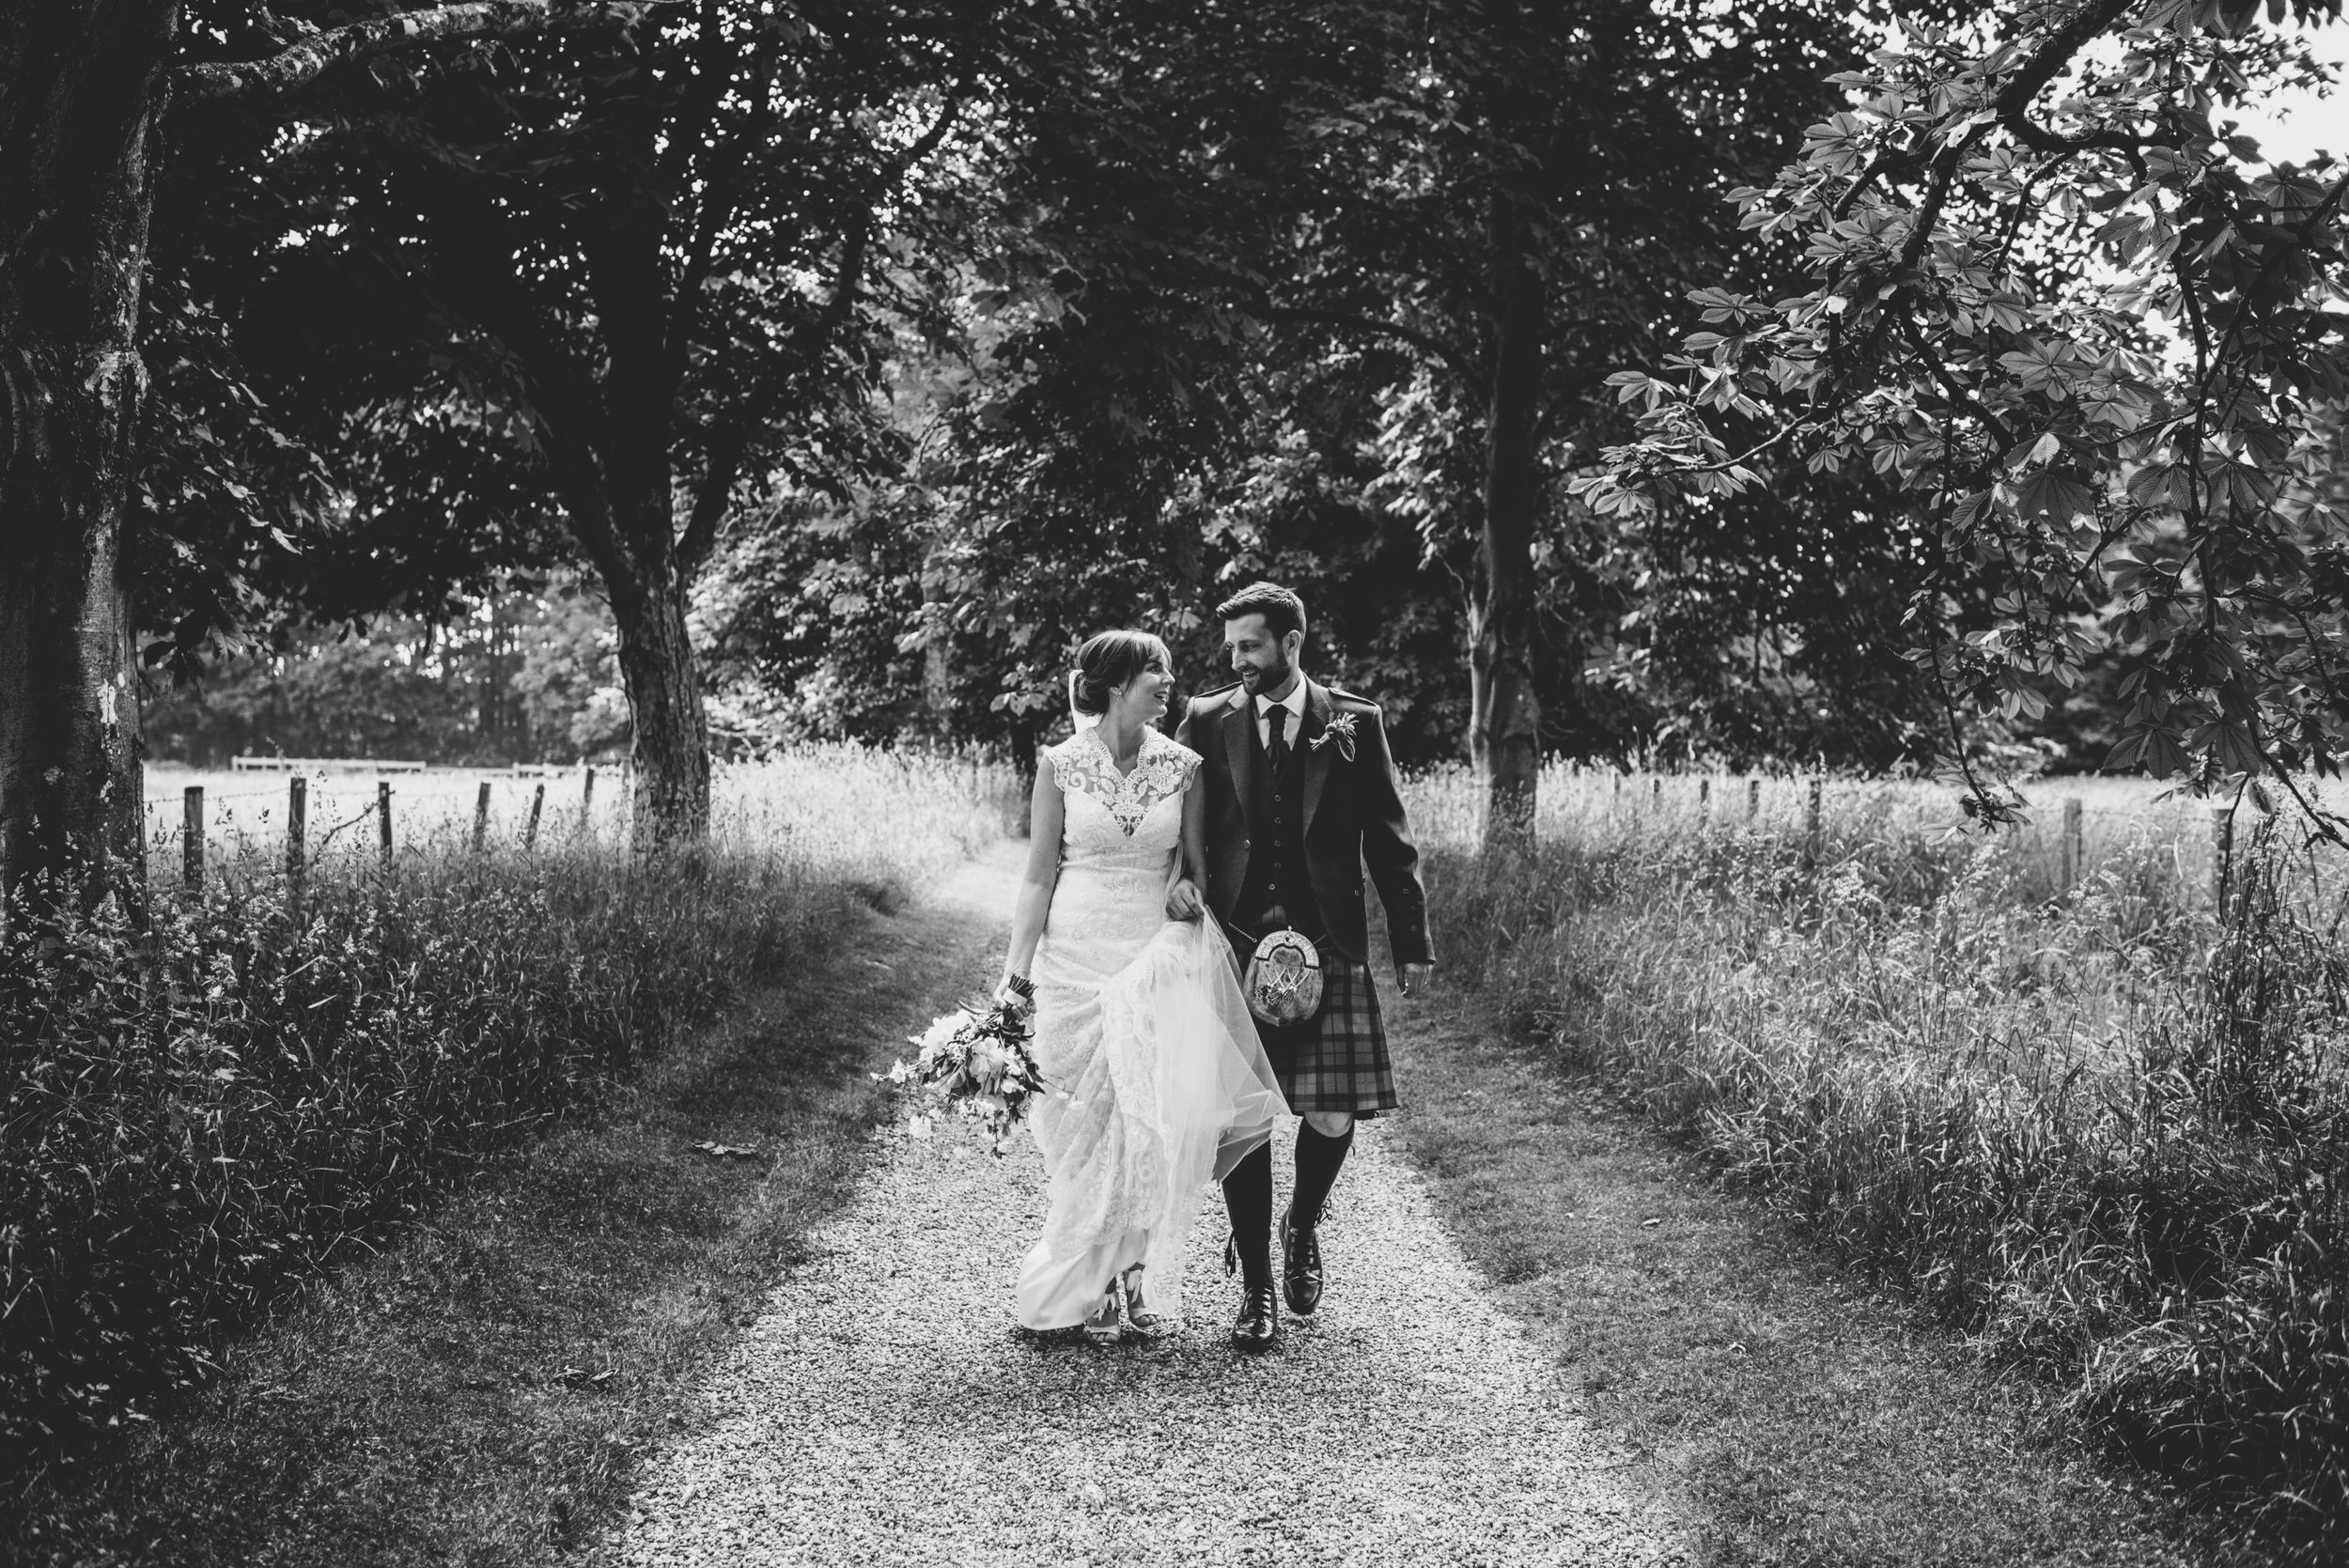 0249-LISA-DEVINE-PHOTOGRAPHY-ALTERNATIVE-WEDDING-PHOTOGRAPHY-SCOTLAND-DESTINATION-WEDDINGS-GLASGOW-WEDDINGS-COOL-WEDDINGS-STYLISH-WEDDINGS.JPG